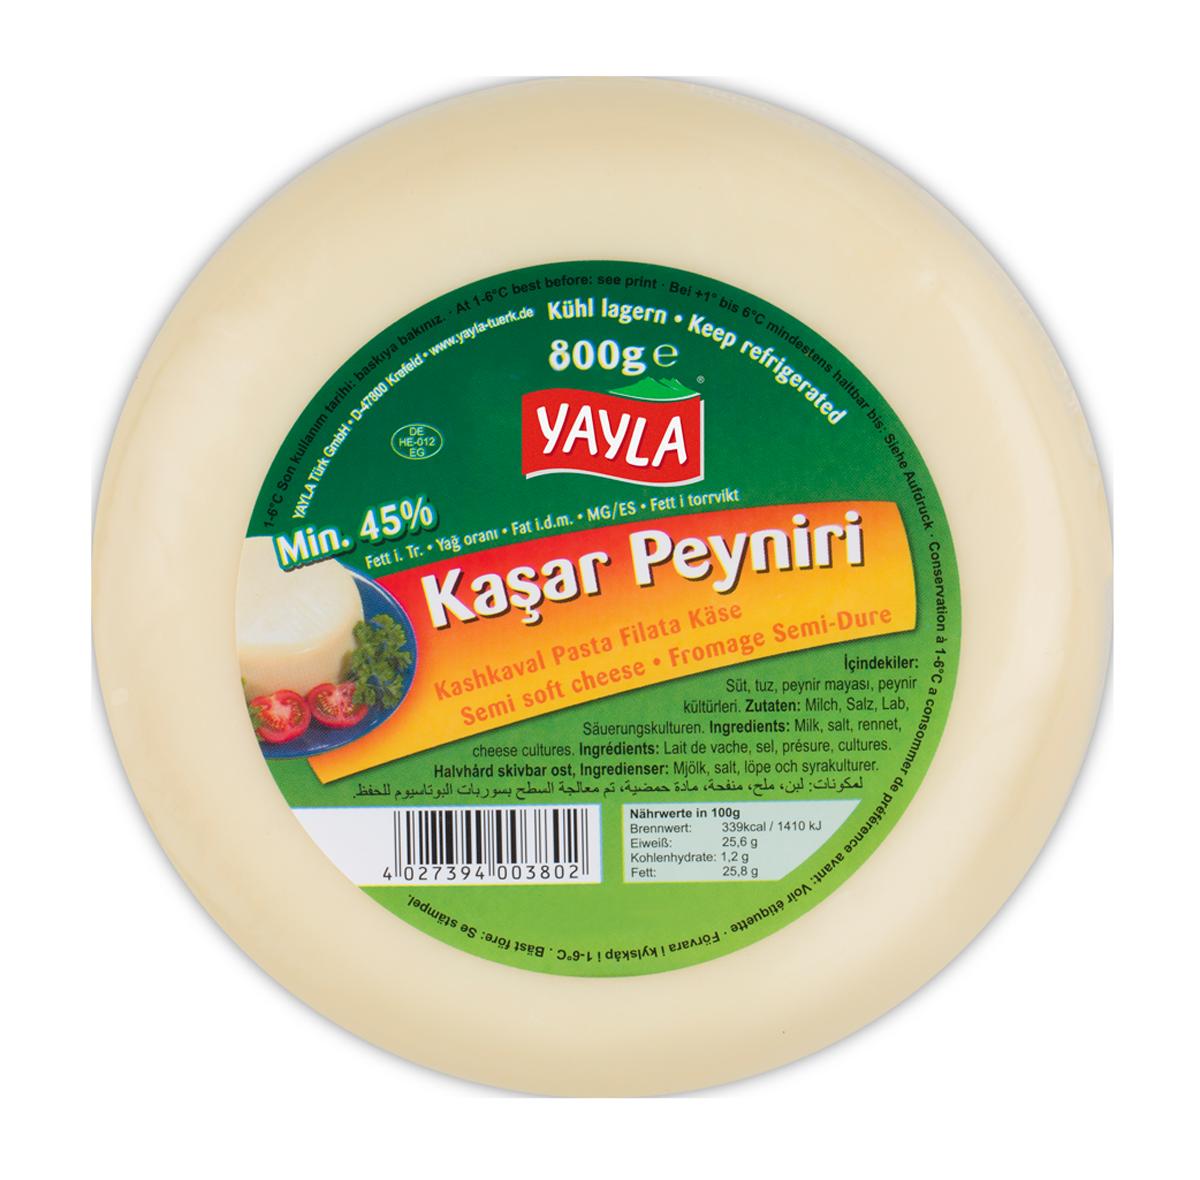 Yayla Kasar Peyniri / Kashkaval Schnittkäse 800g